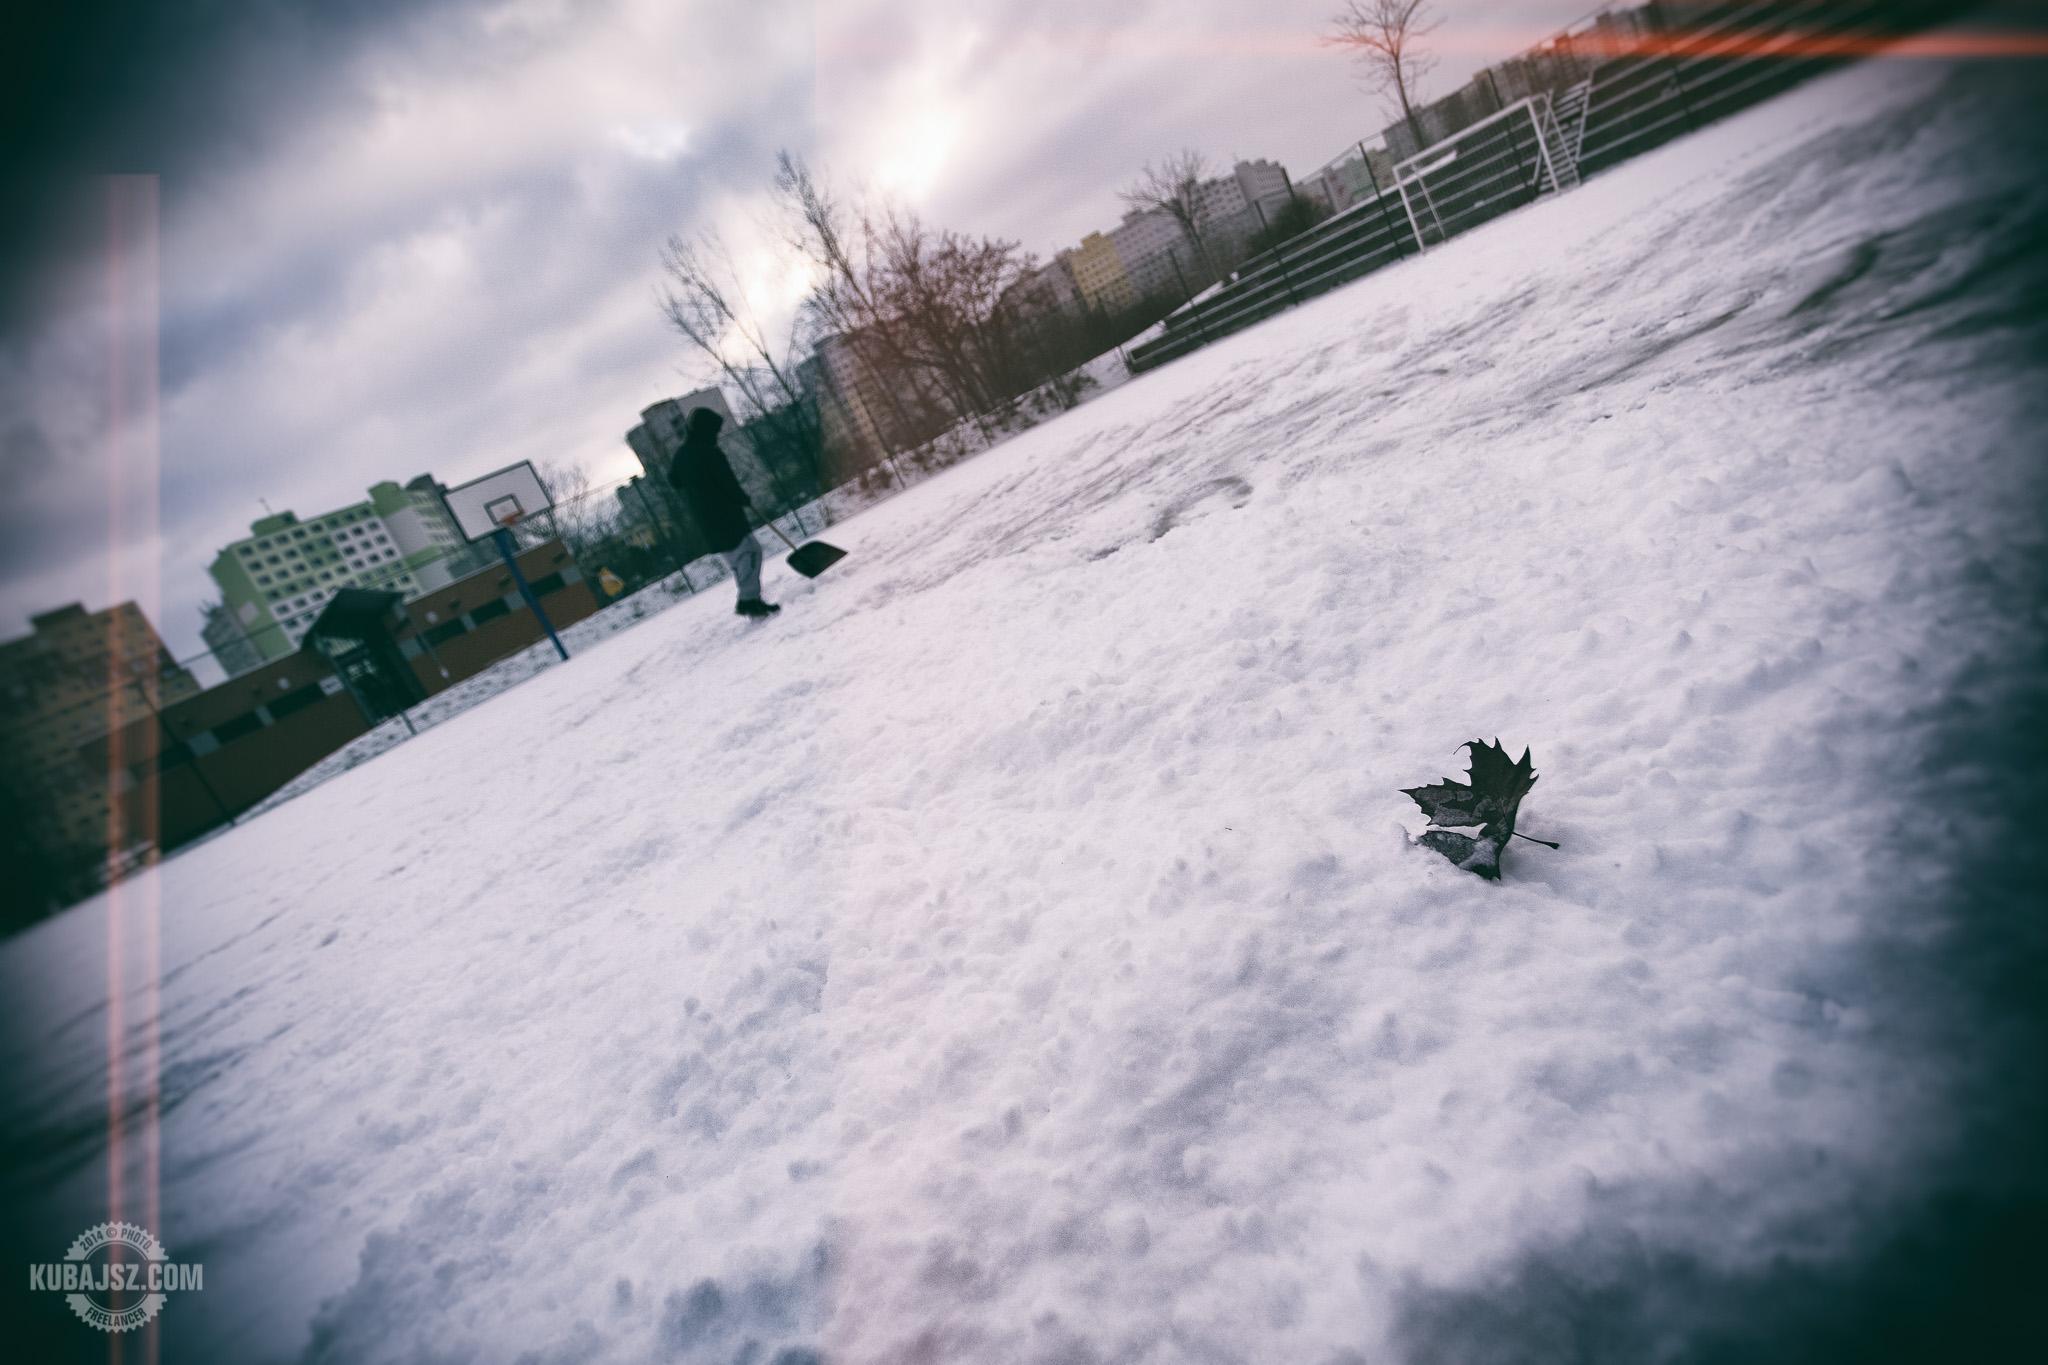 IMG_6414-Edit-2